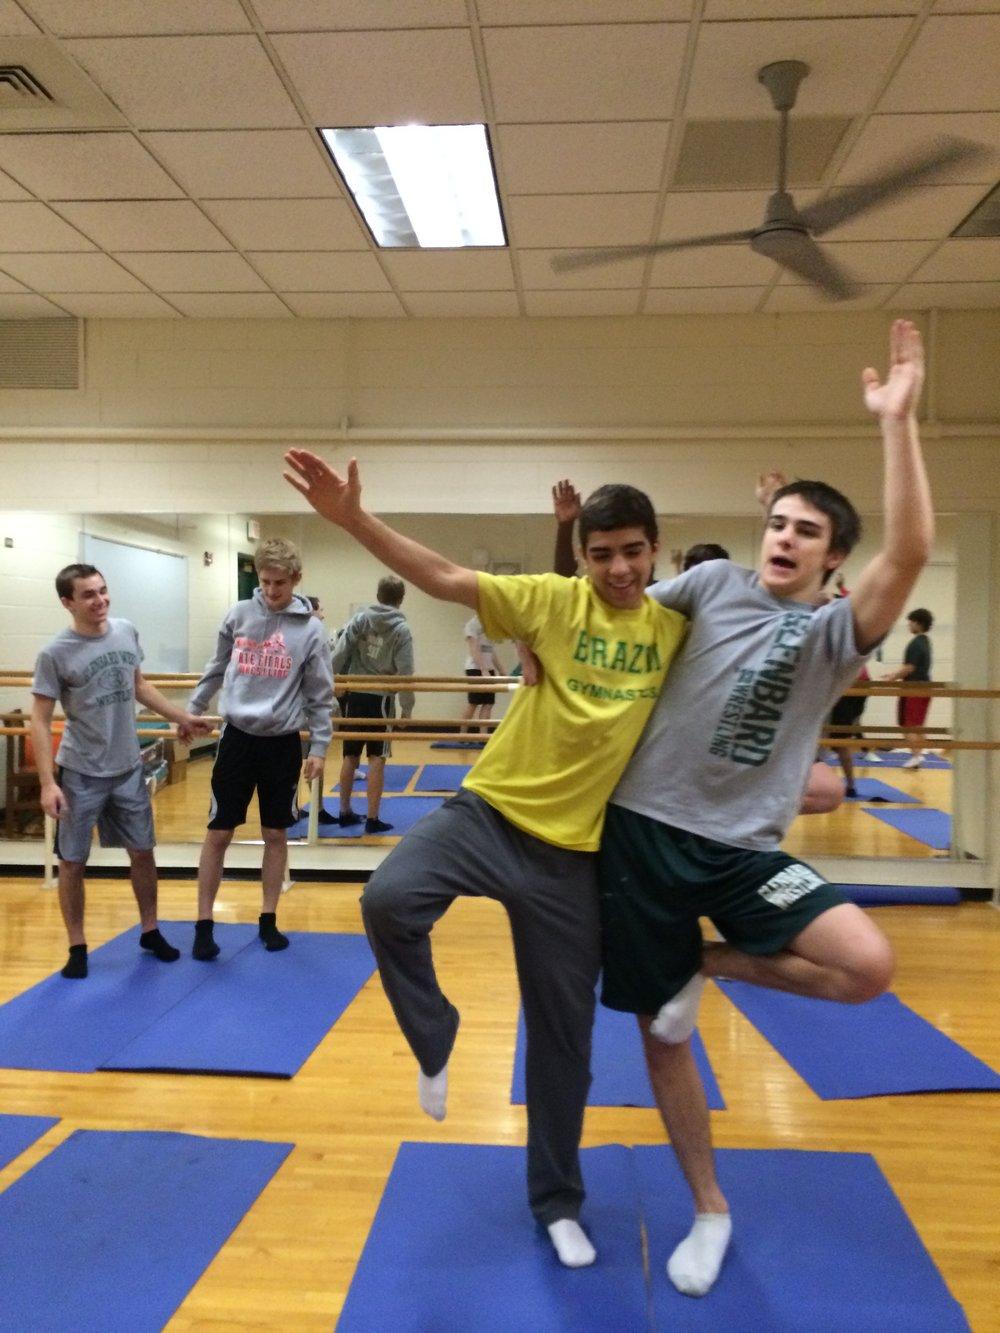 gdub yoga club 4.JPG